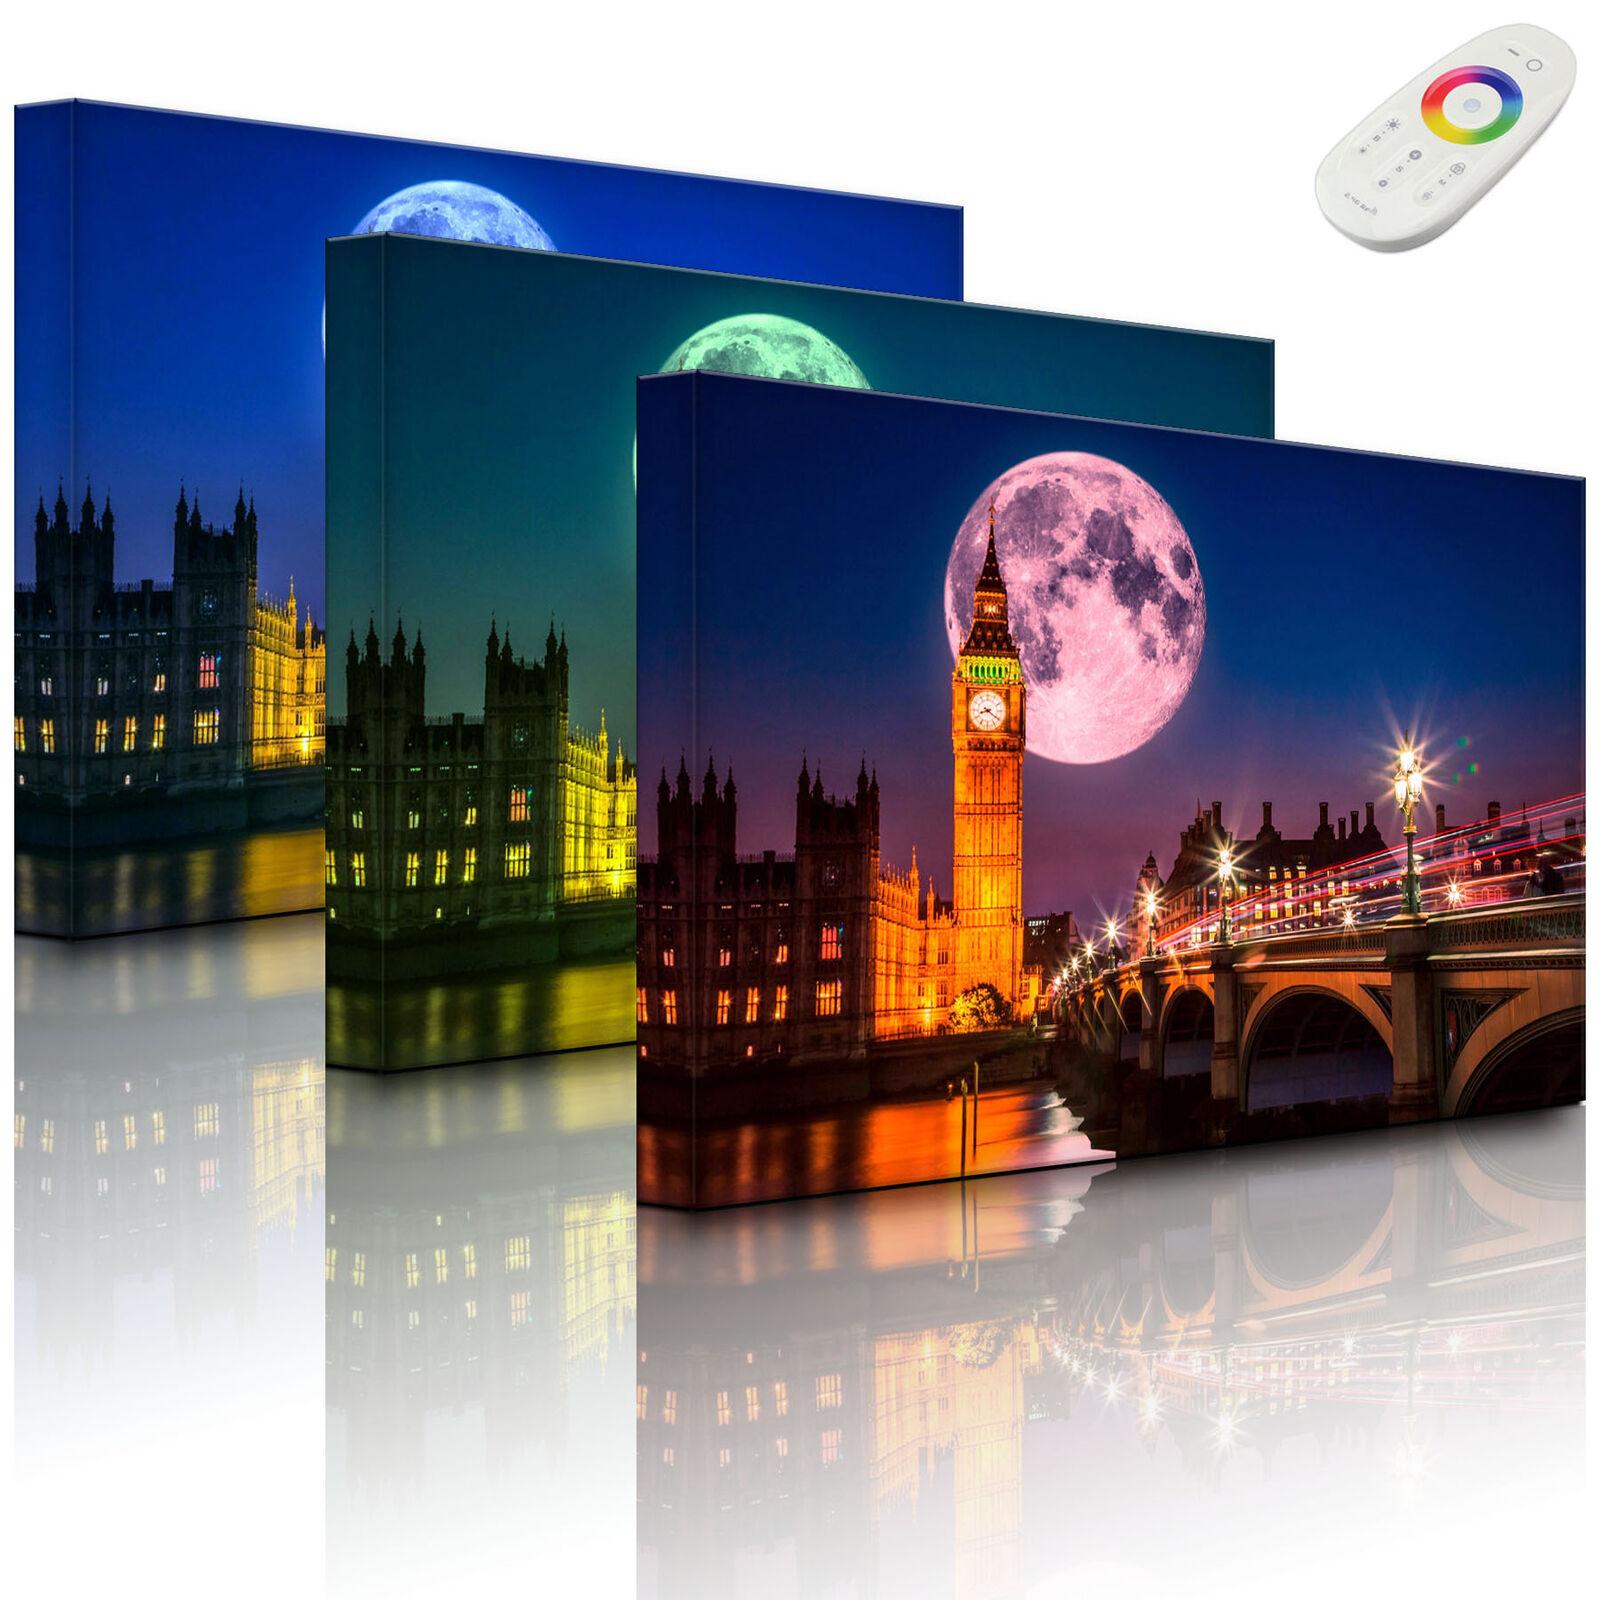 Leuchtbild LED Bild - Big Ben vor großen Mond in London - fully lighted